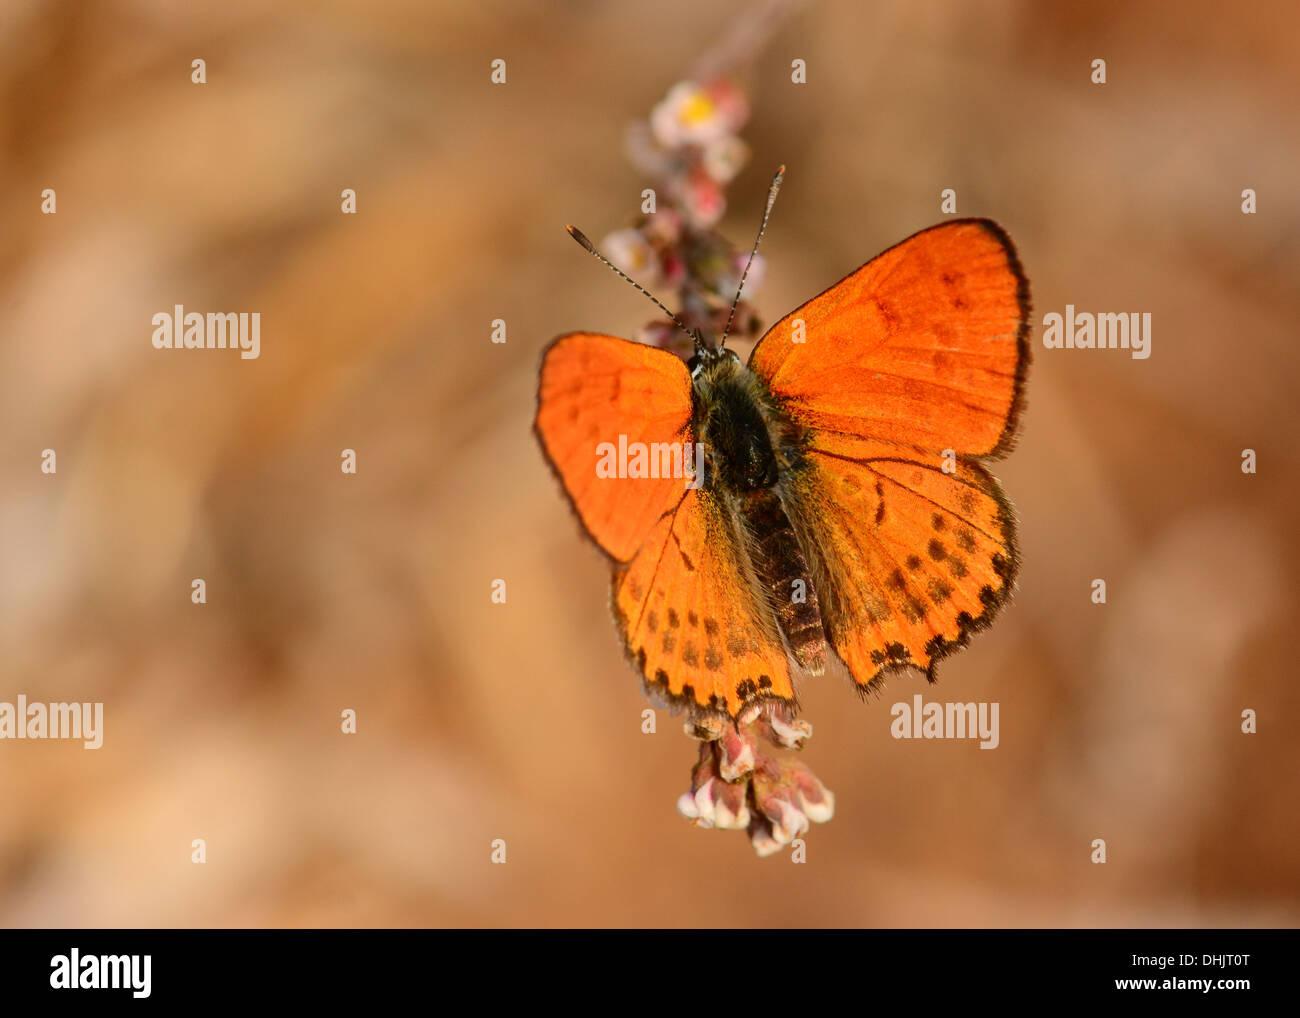 Fiery moindre Cuivre, Butterfly Photo Stock